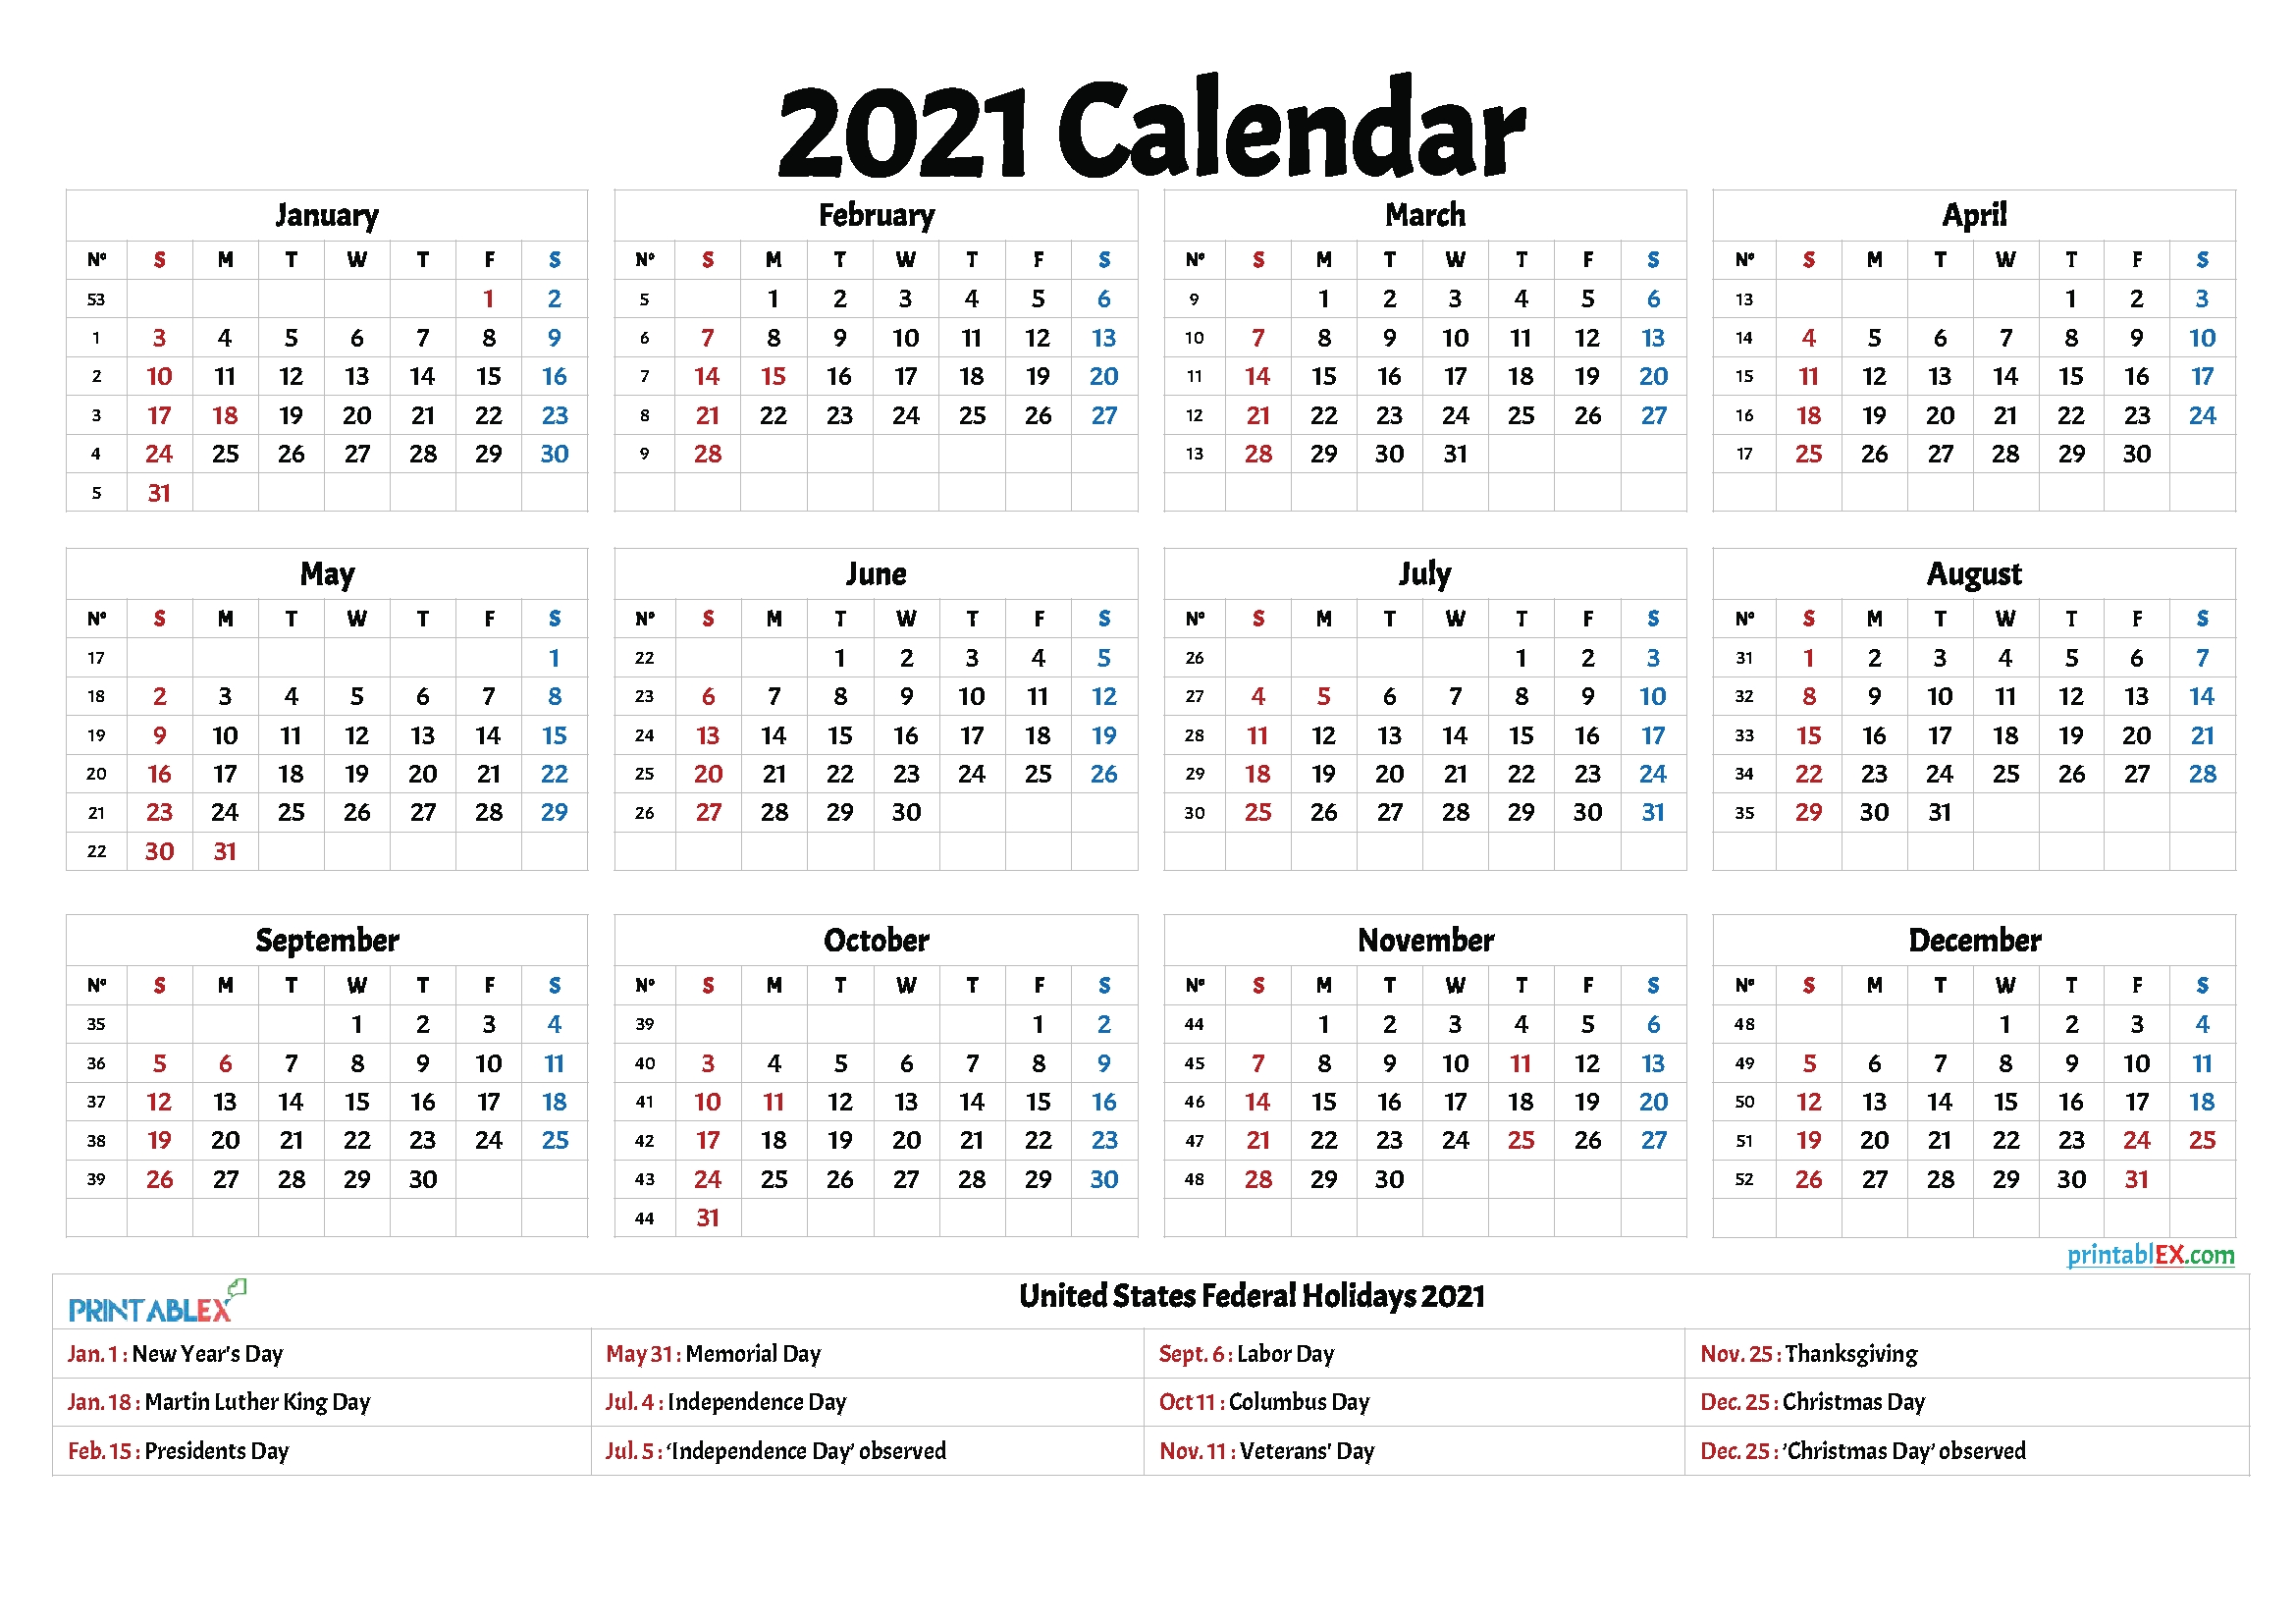 2021 calendar with federal holidays | free 2021 printable